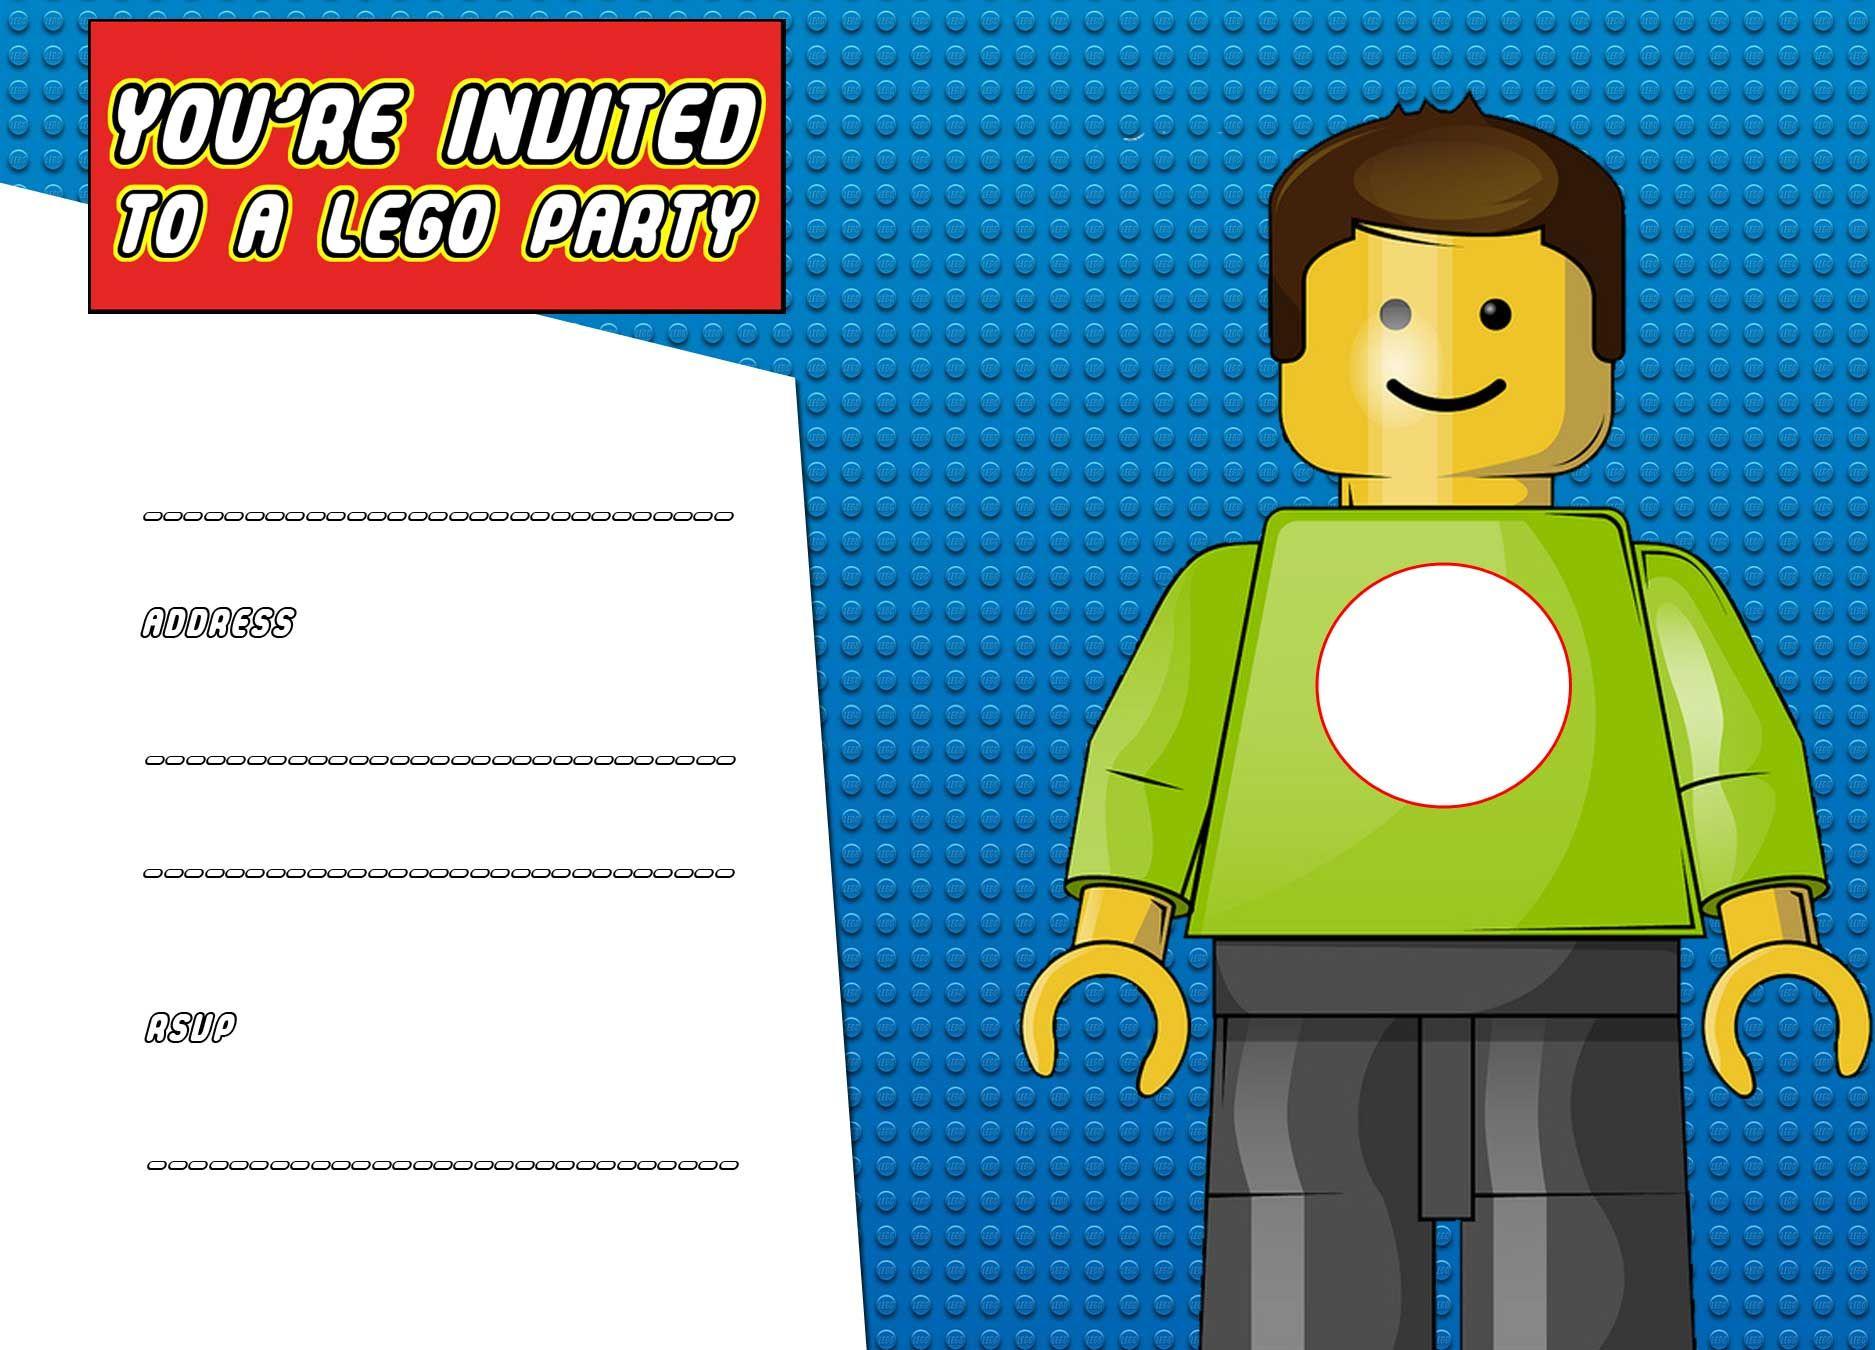 Download Now Free Printable Lego Birthday Invitation Template - Lego Party Invitations Printable Free